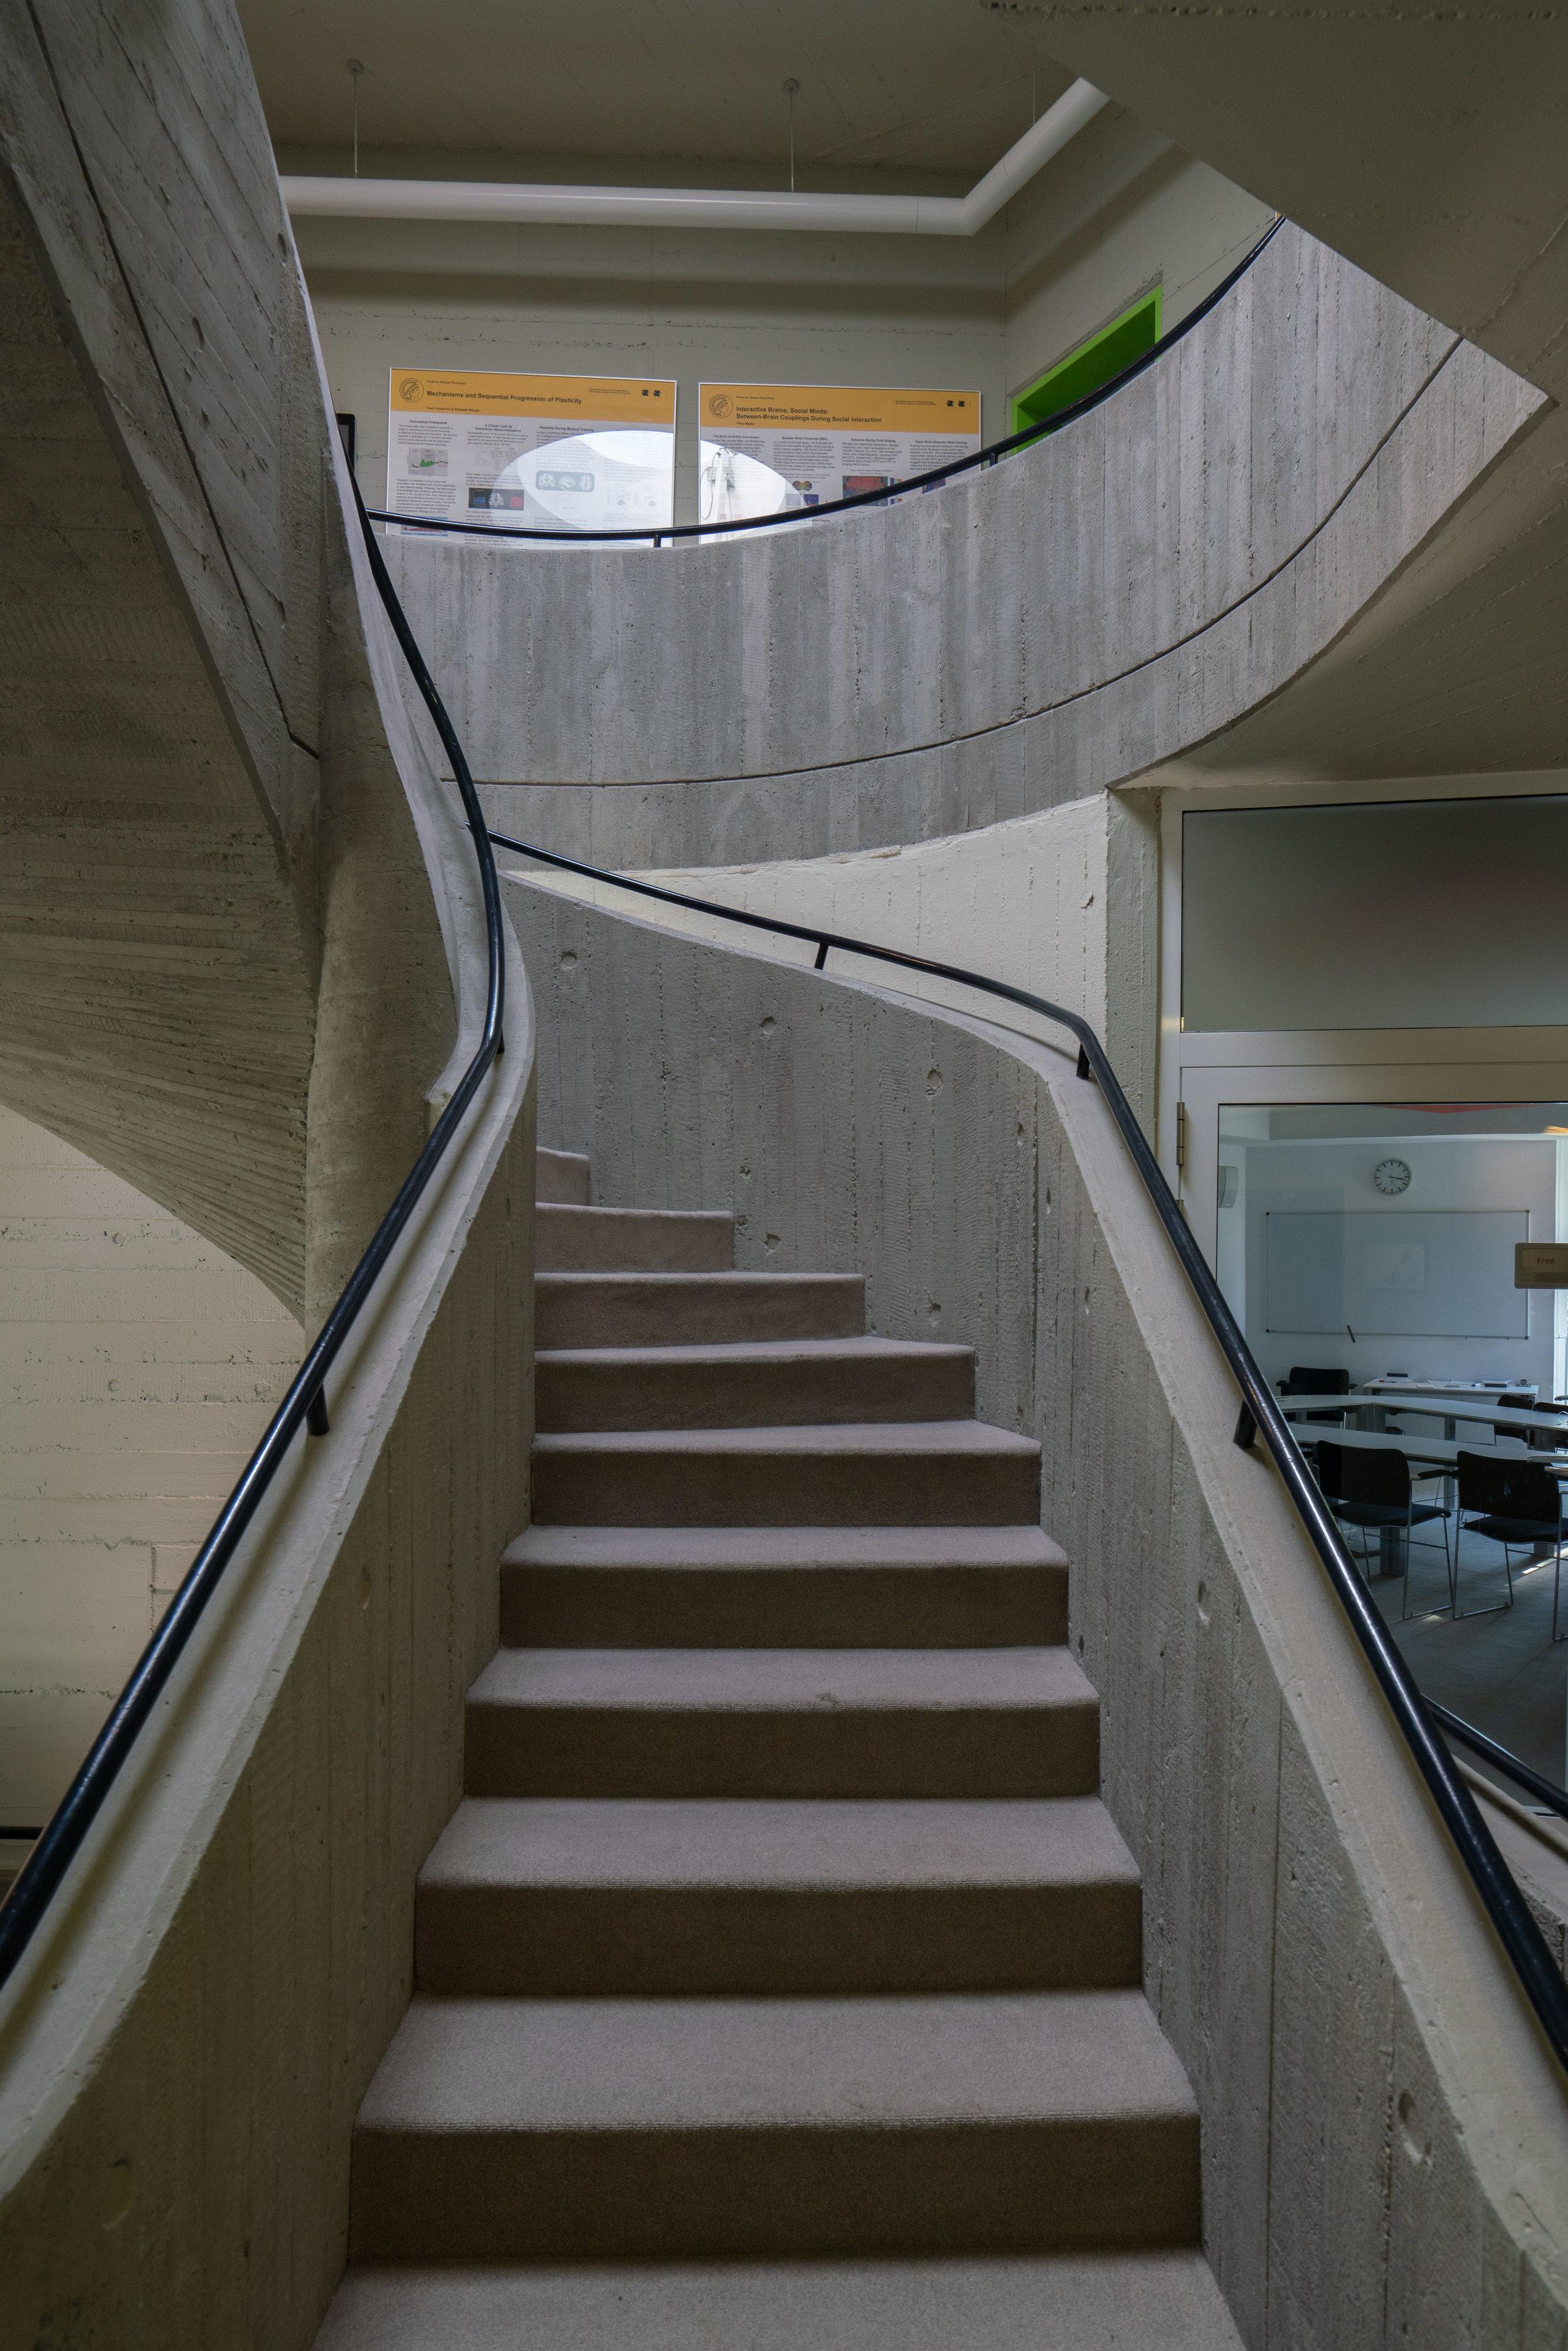 181012_Fehling+Gogel, Max Planck Institute_15.jpg